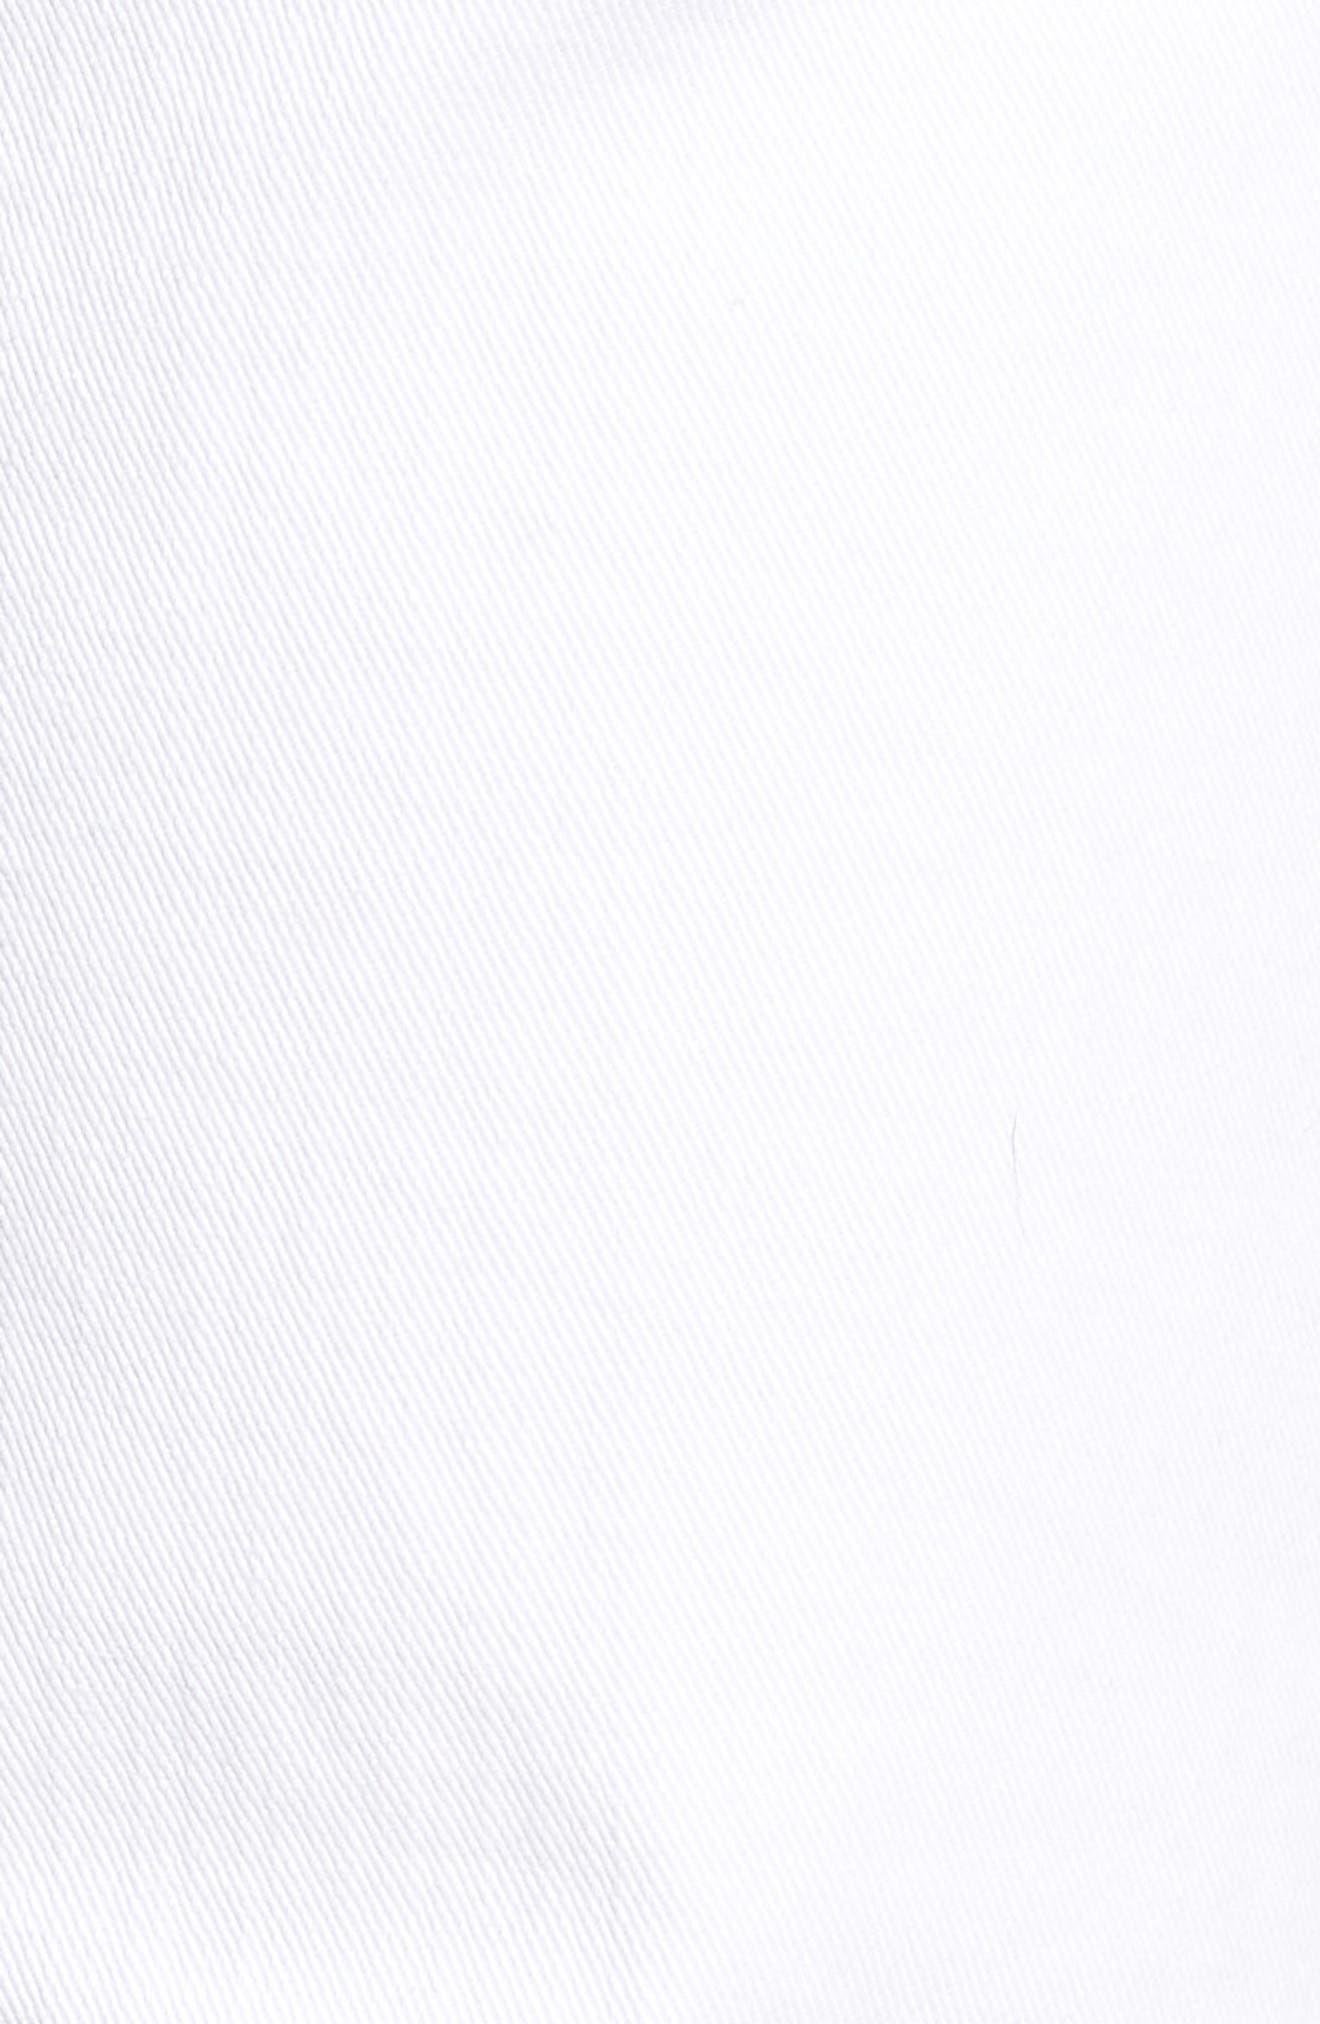 Mick Distressed Skinny Fit Jeans,                             Alternate thumbnail 5, color,                             WHITMAN OAK